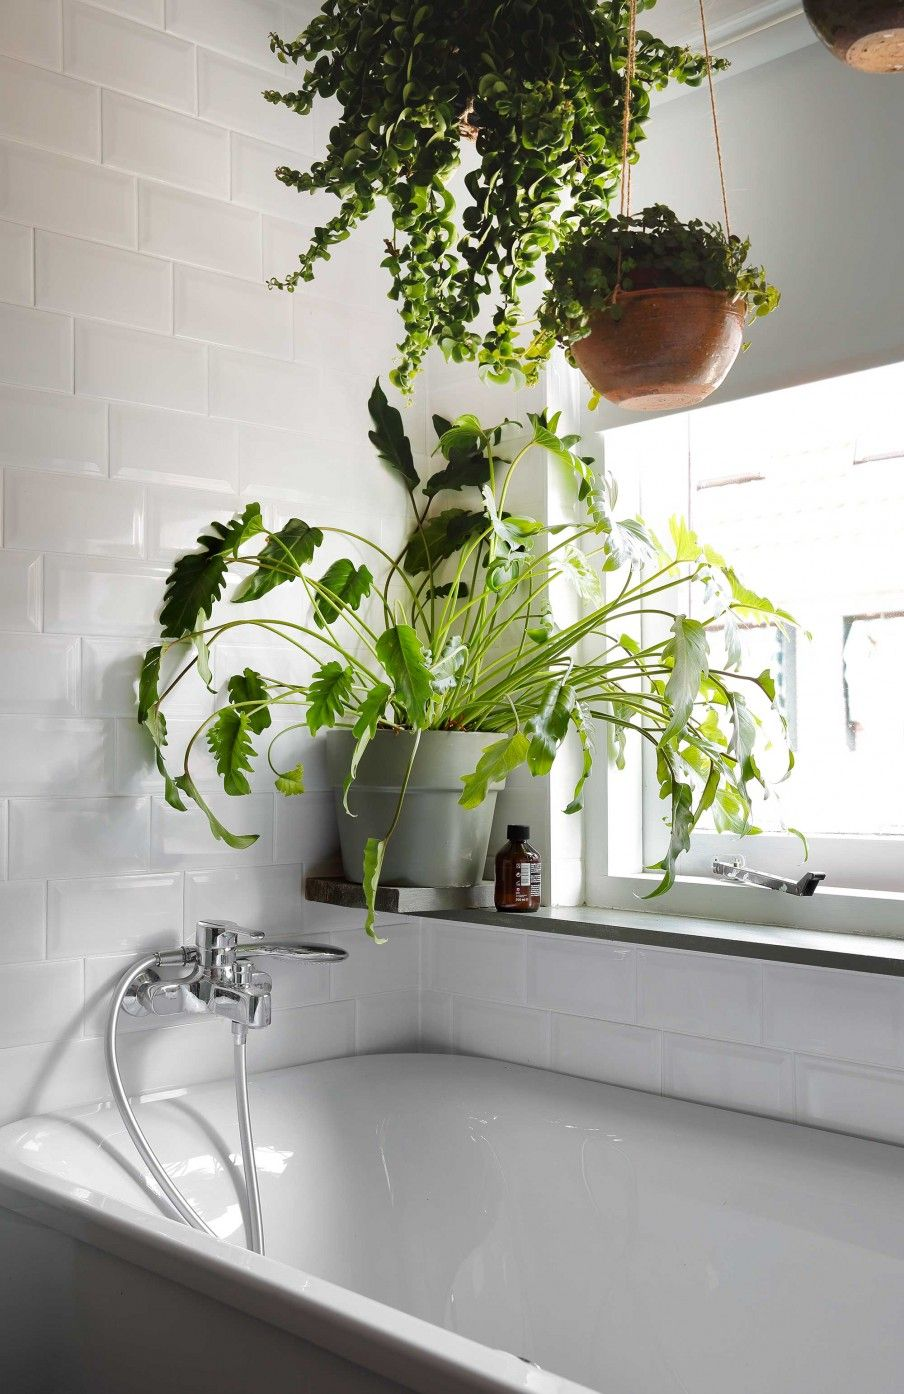 12-badkamer-planten - T U B | Pinterest - Badkamer planten, Badkamer ...